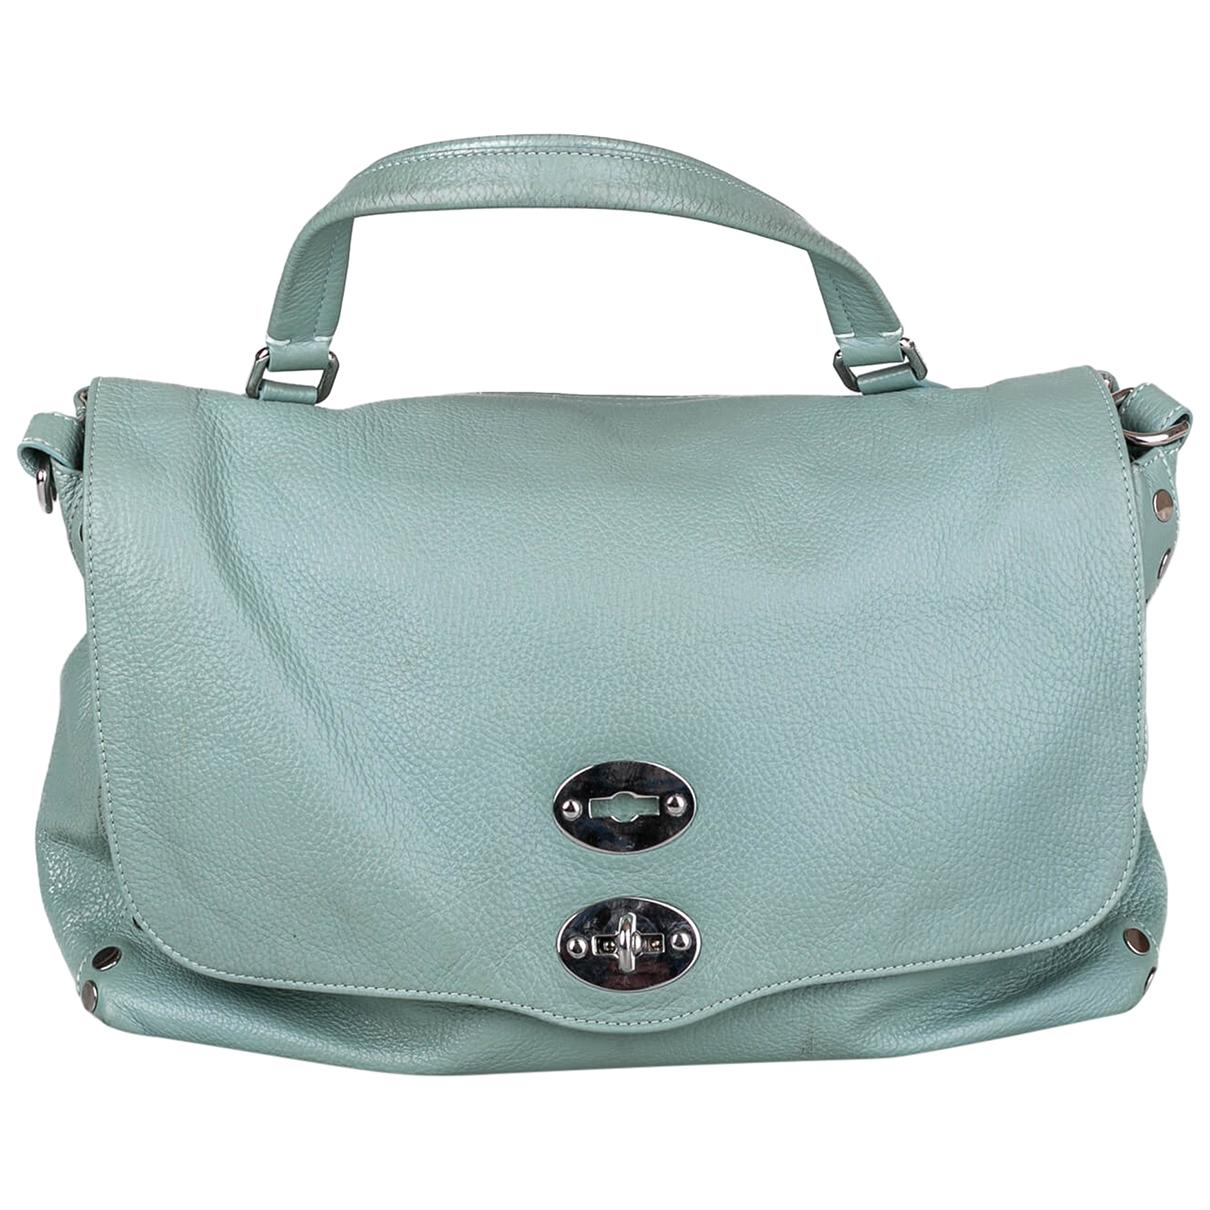 Zanellato \N Cloth handbag for Women \N